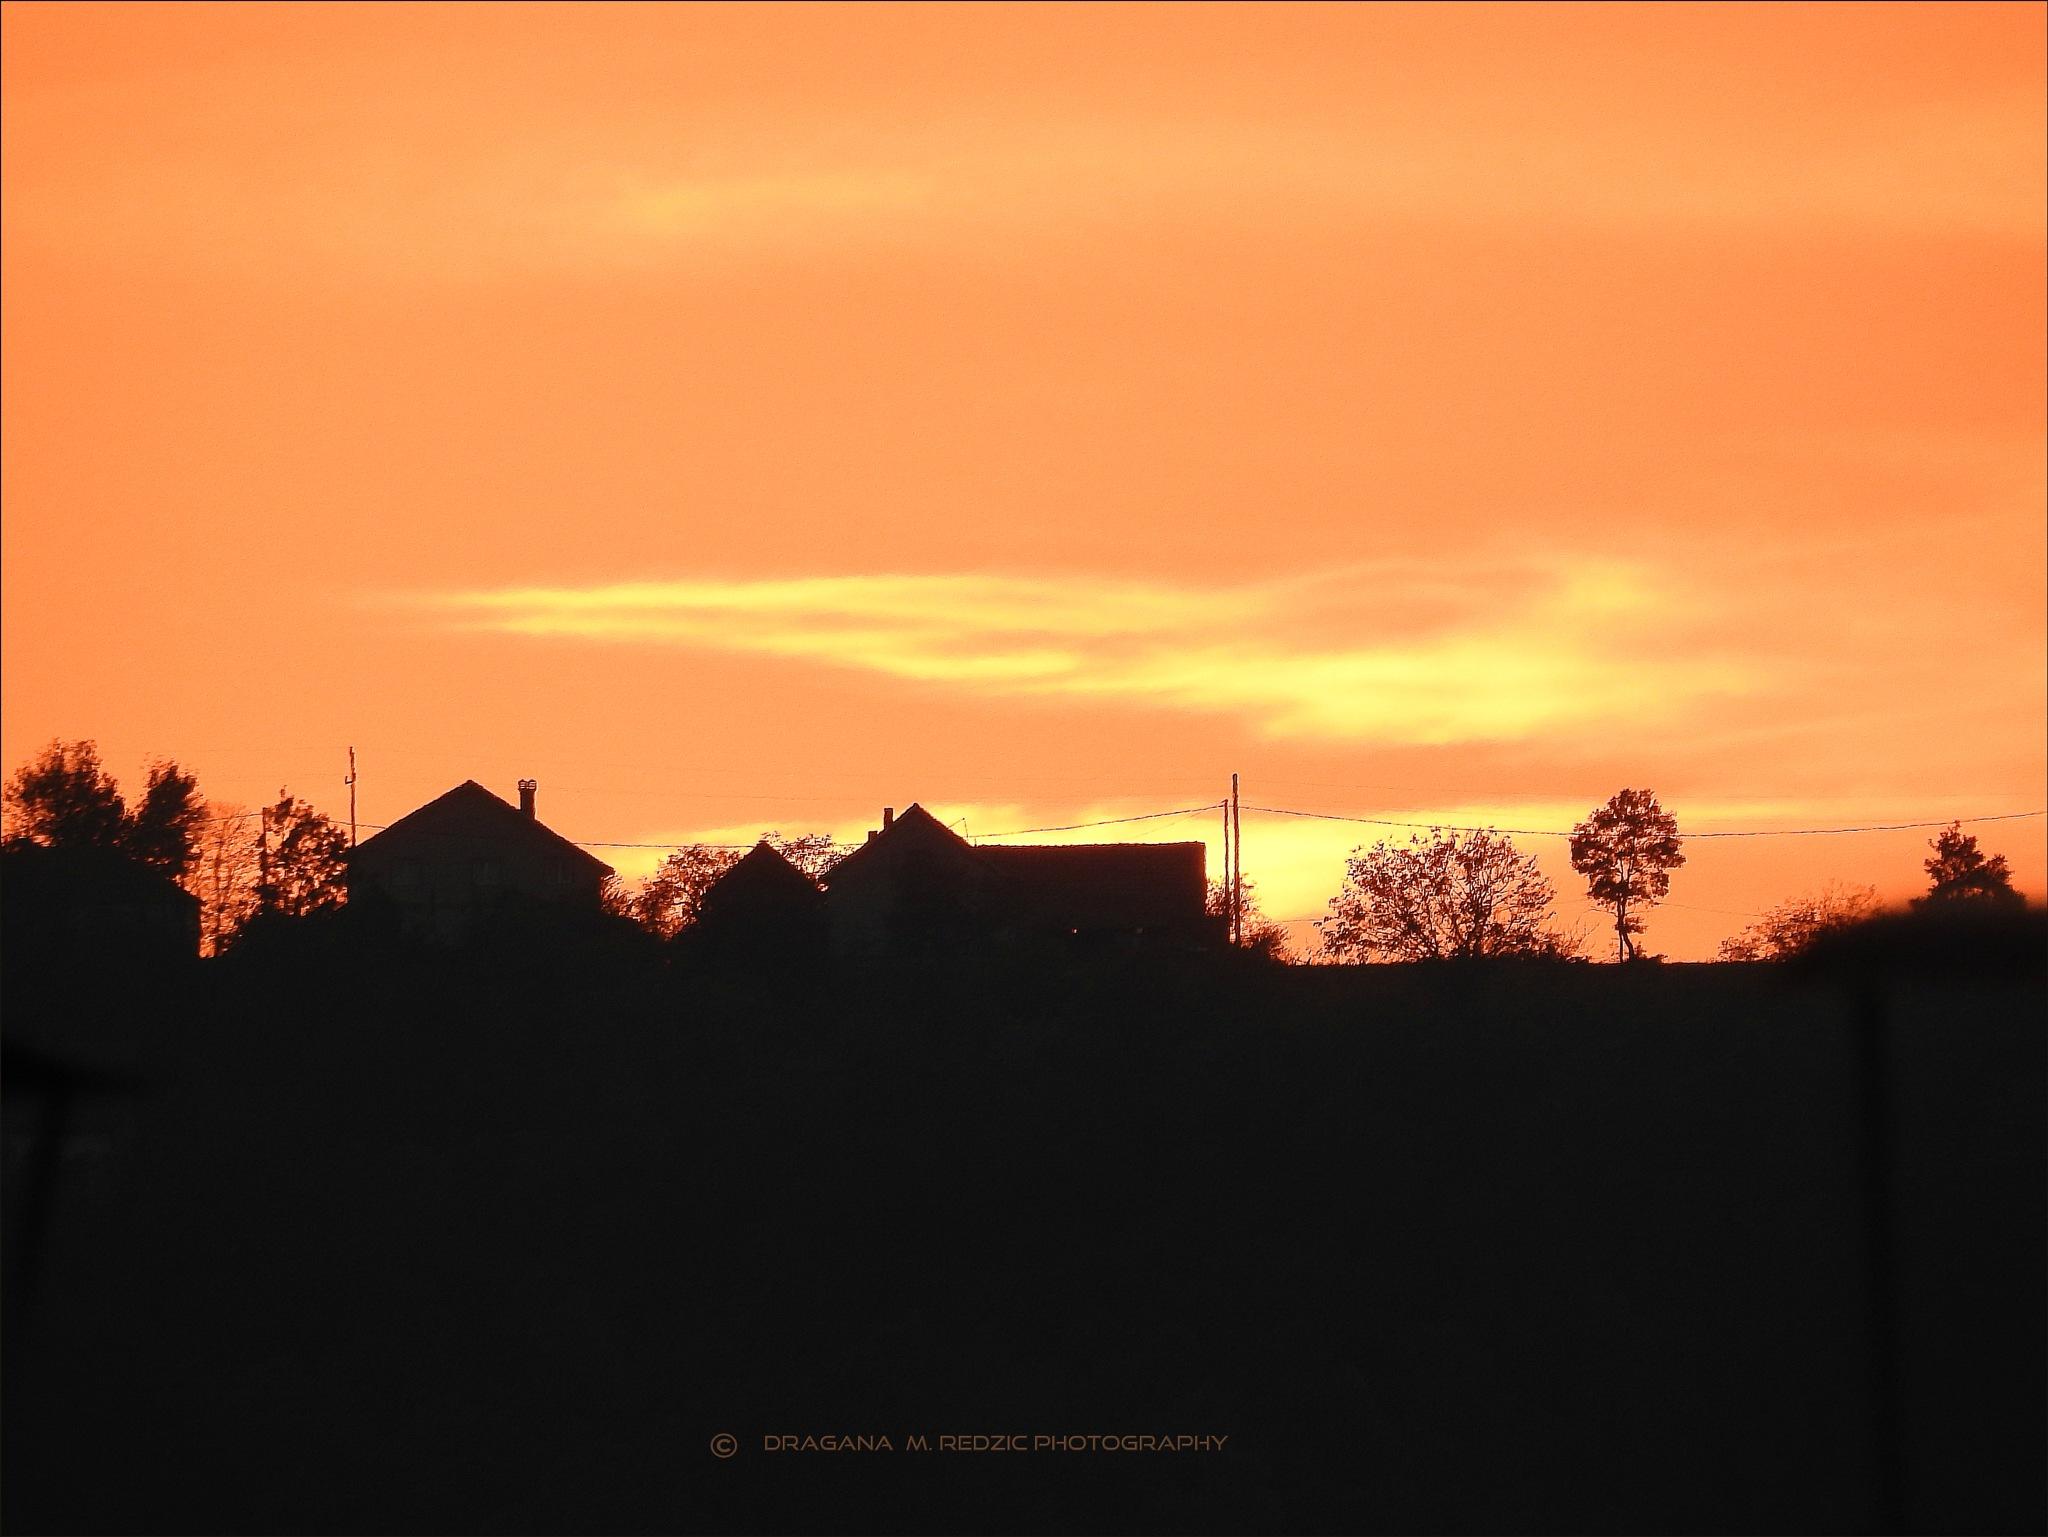 Sunset 14 km away by Драгана М. Реџић